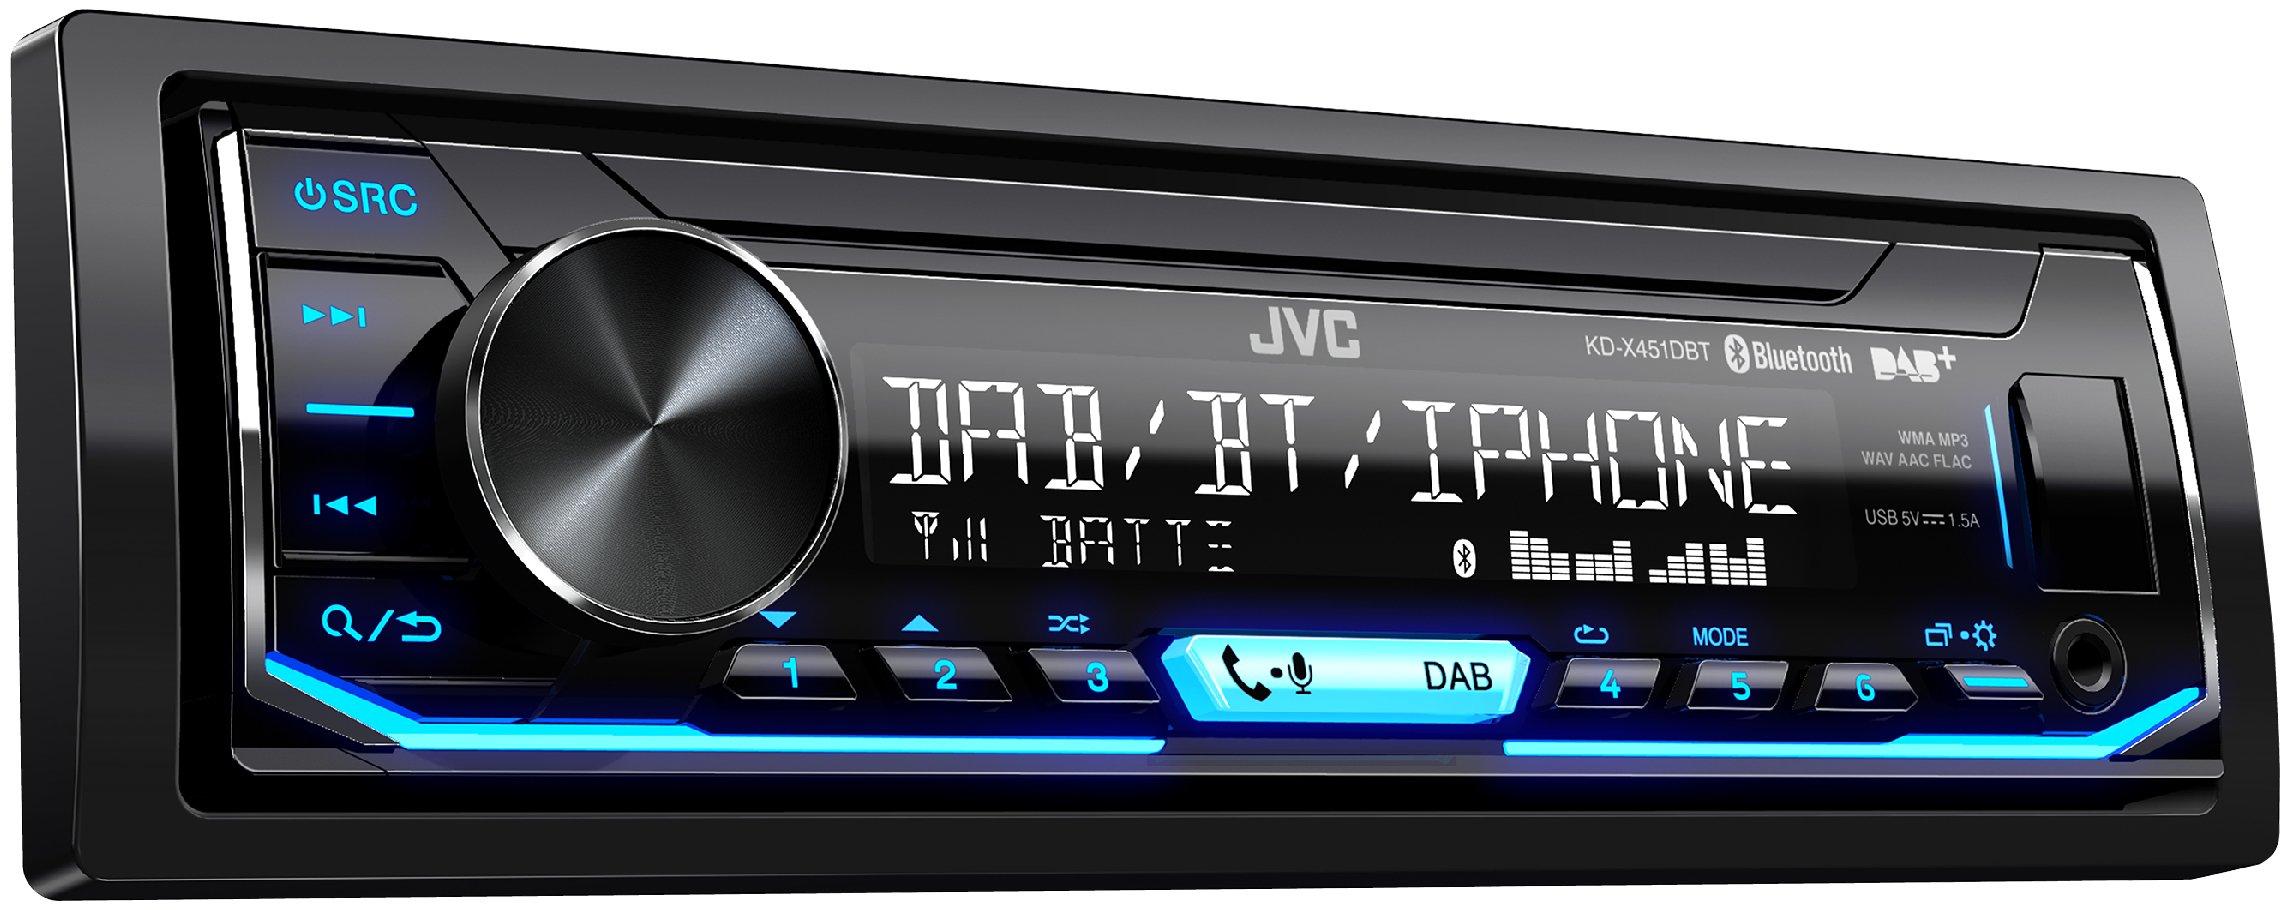 Antenne Splitter Adapter Auto Radio kompatibel mit JVC Kenwood Sony Pioneer Adapter Universe DAB